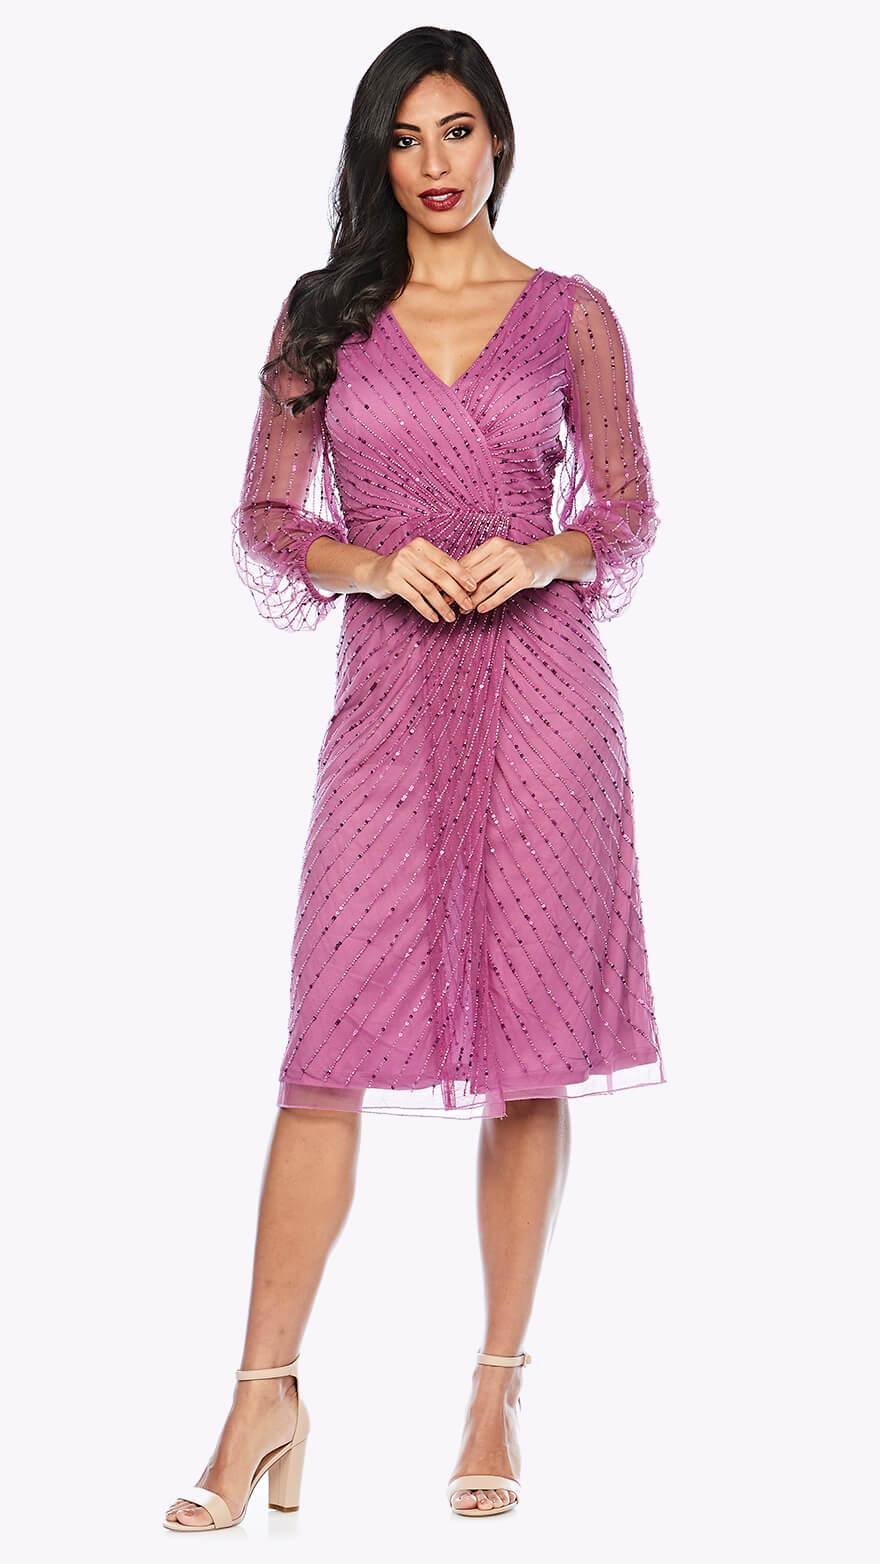 Z0133 Cocktail length peasant sleeve beaded wrap dress